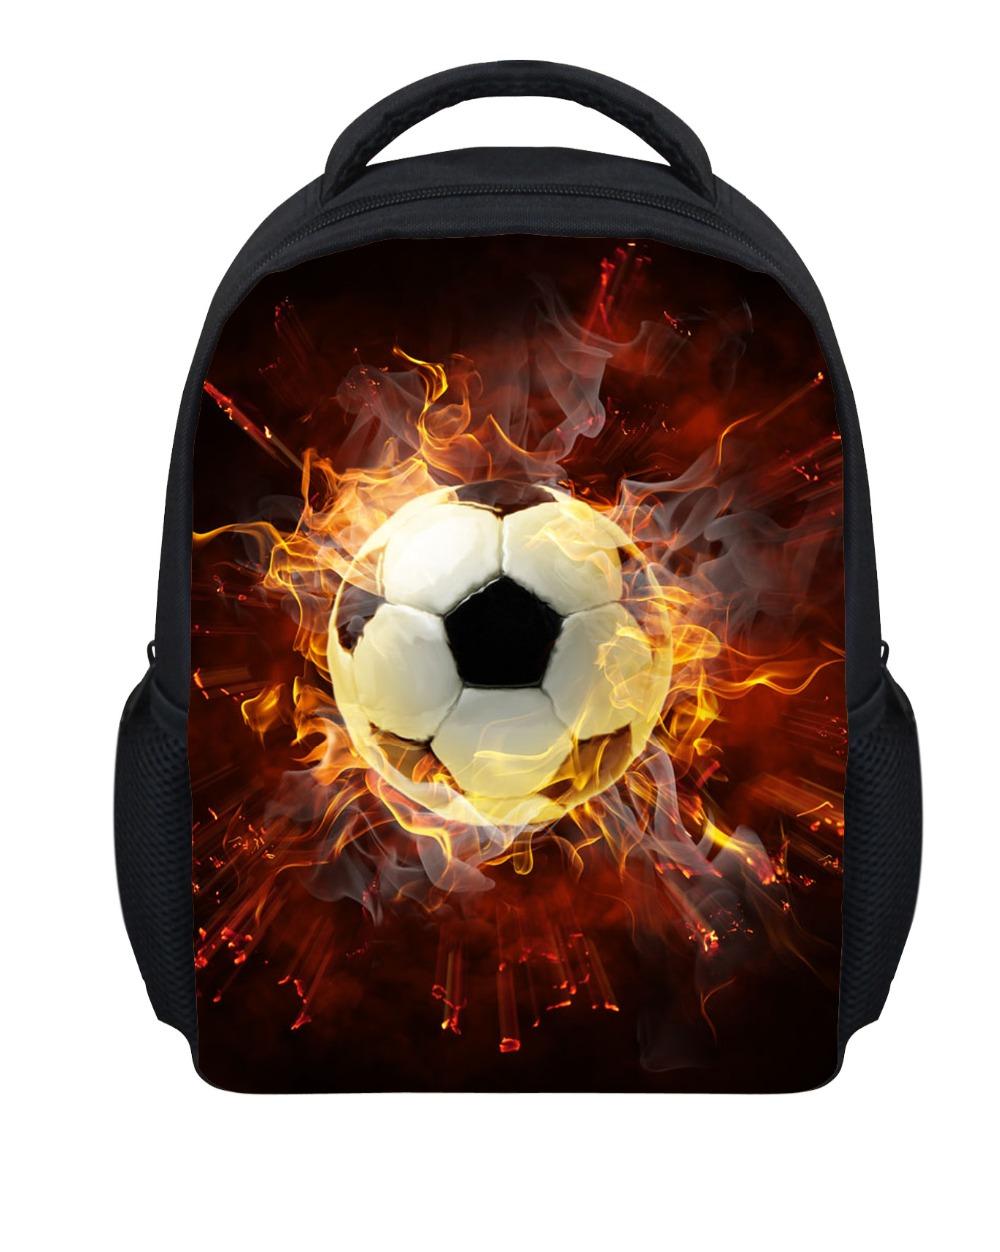 Cool Soccer Sport Boys Bags Mini Children School Bags Orthopedic Fashion Football Printing Kindergarten Kids Schoolbags Mochila(China (Mainland))